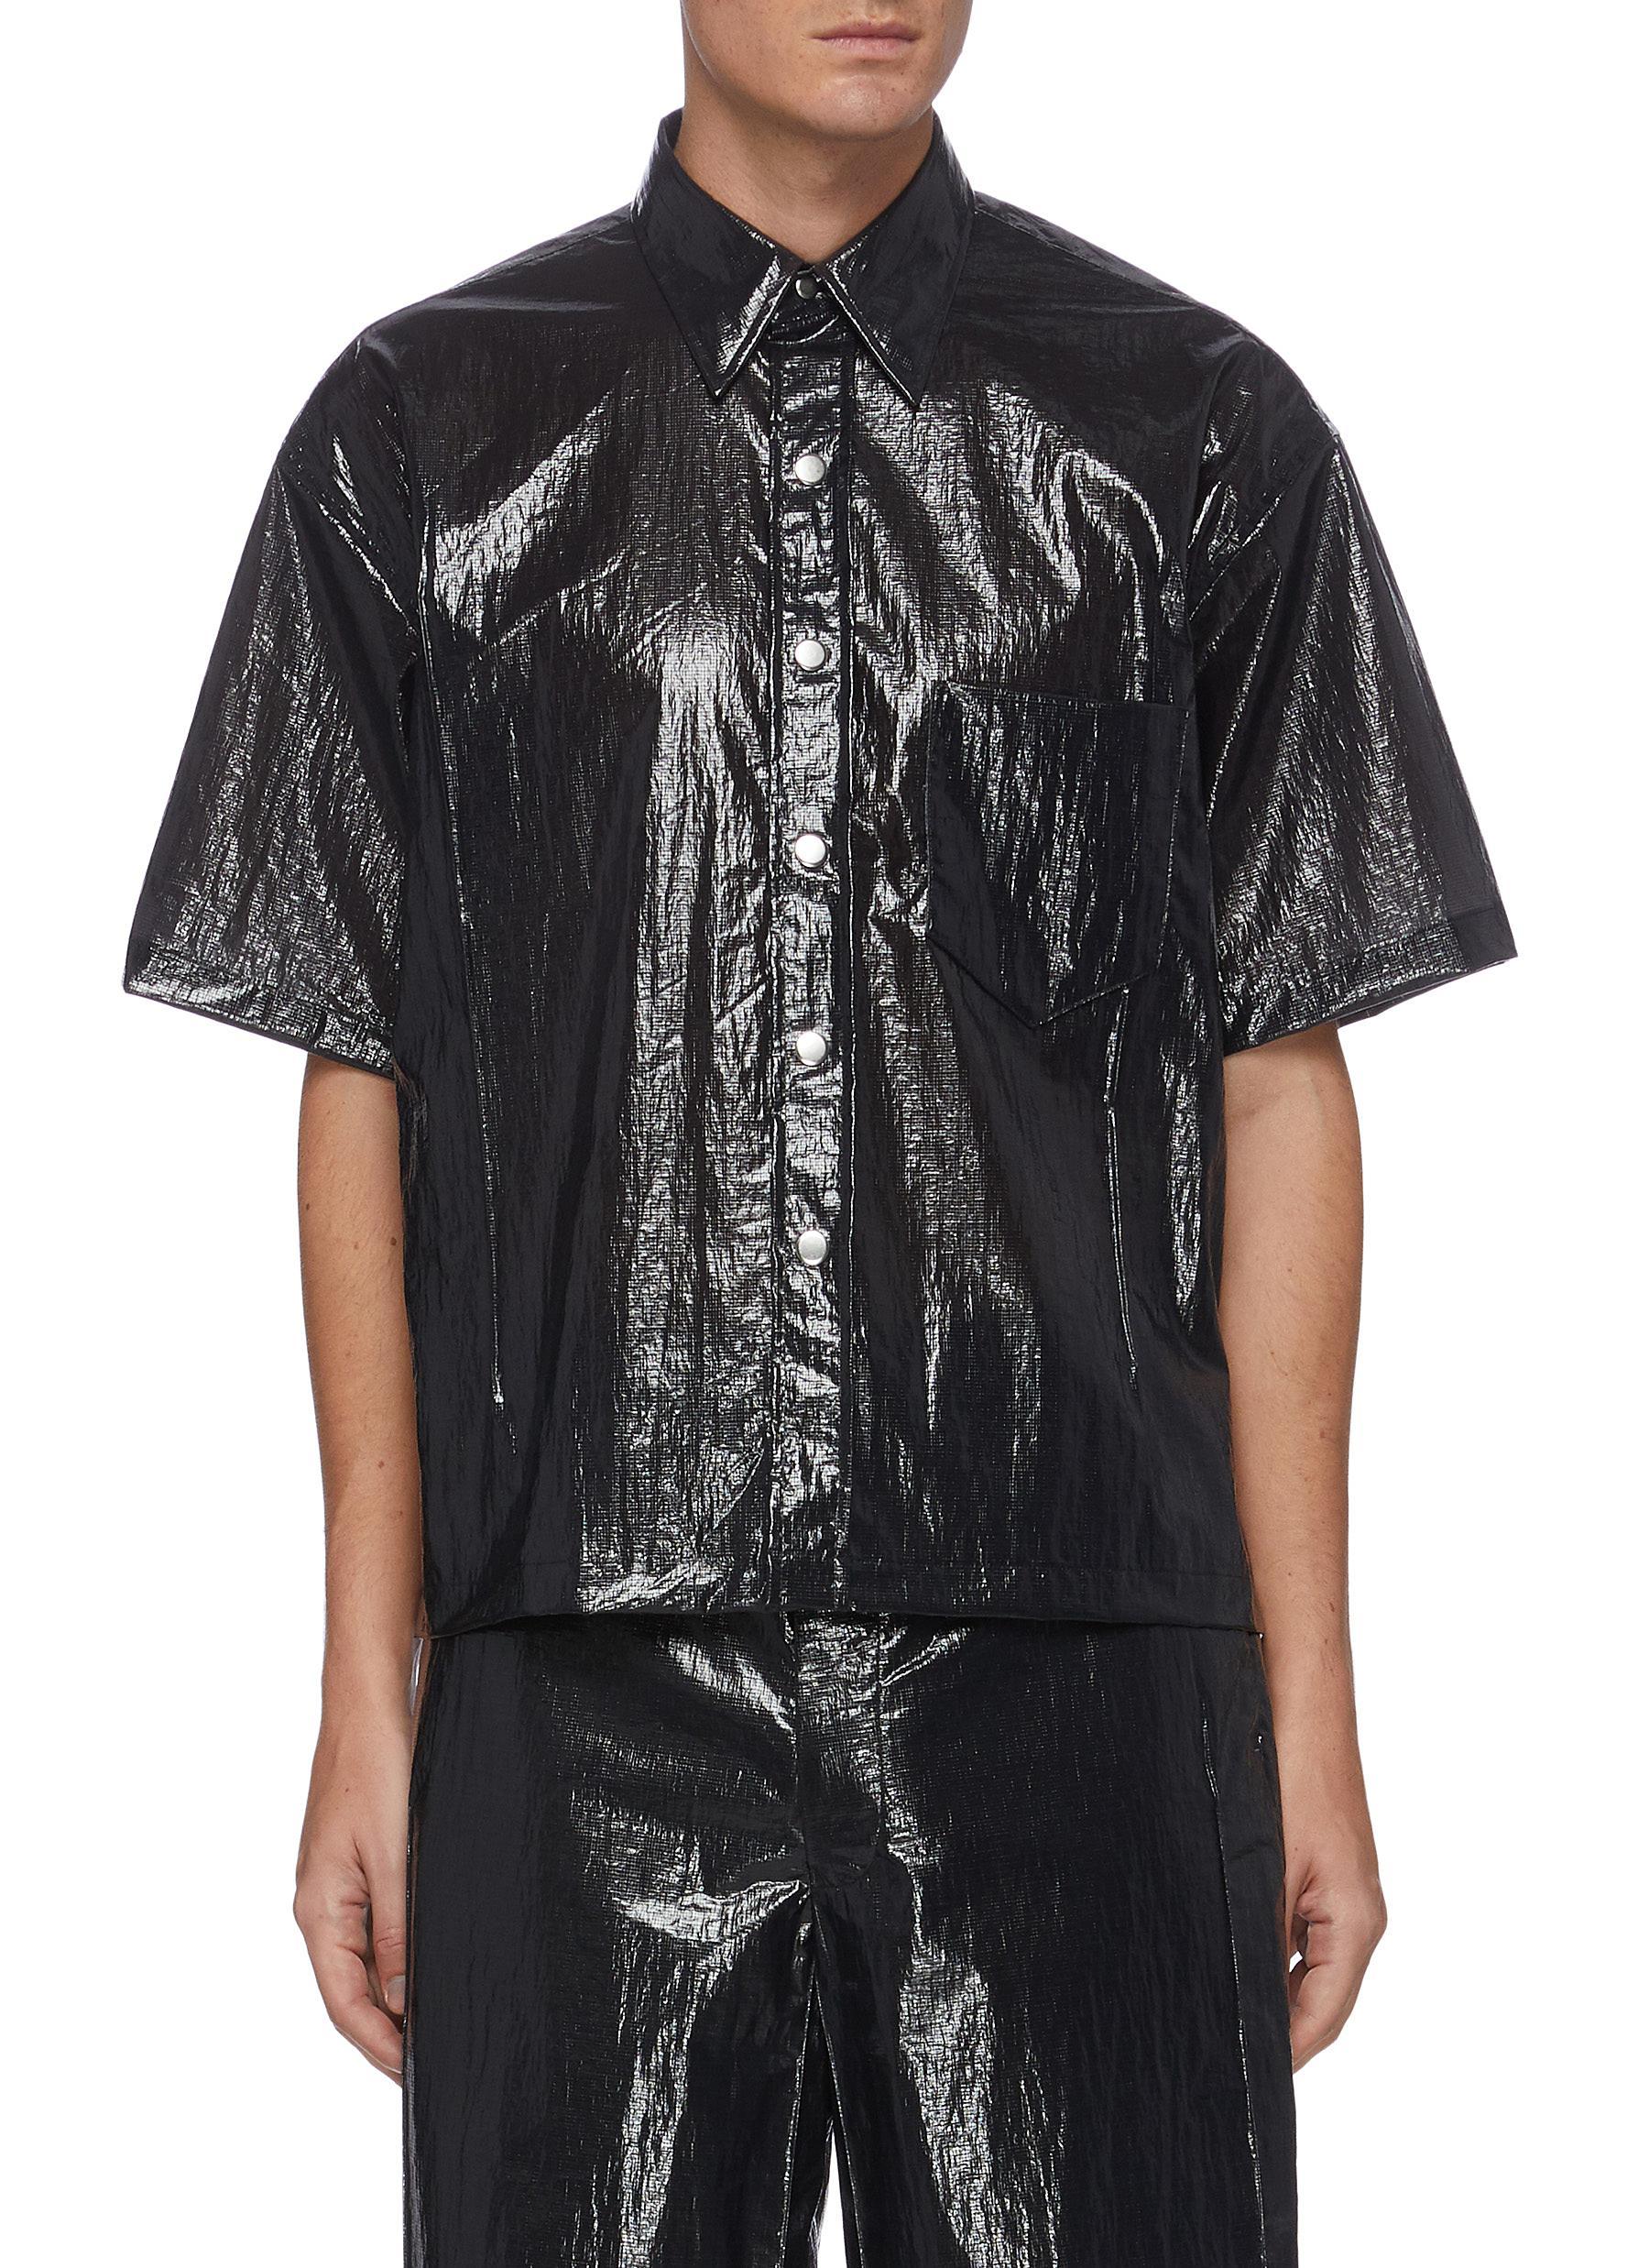 'Cuboid' nylon short sleeve shirt